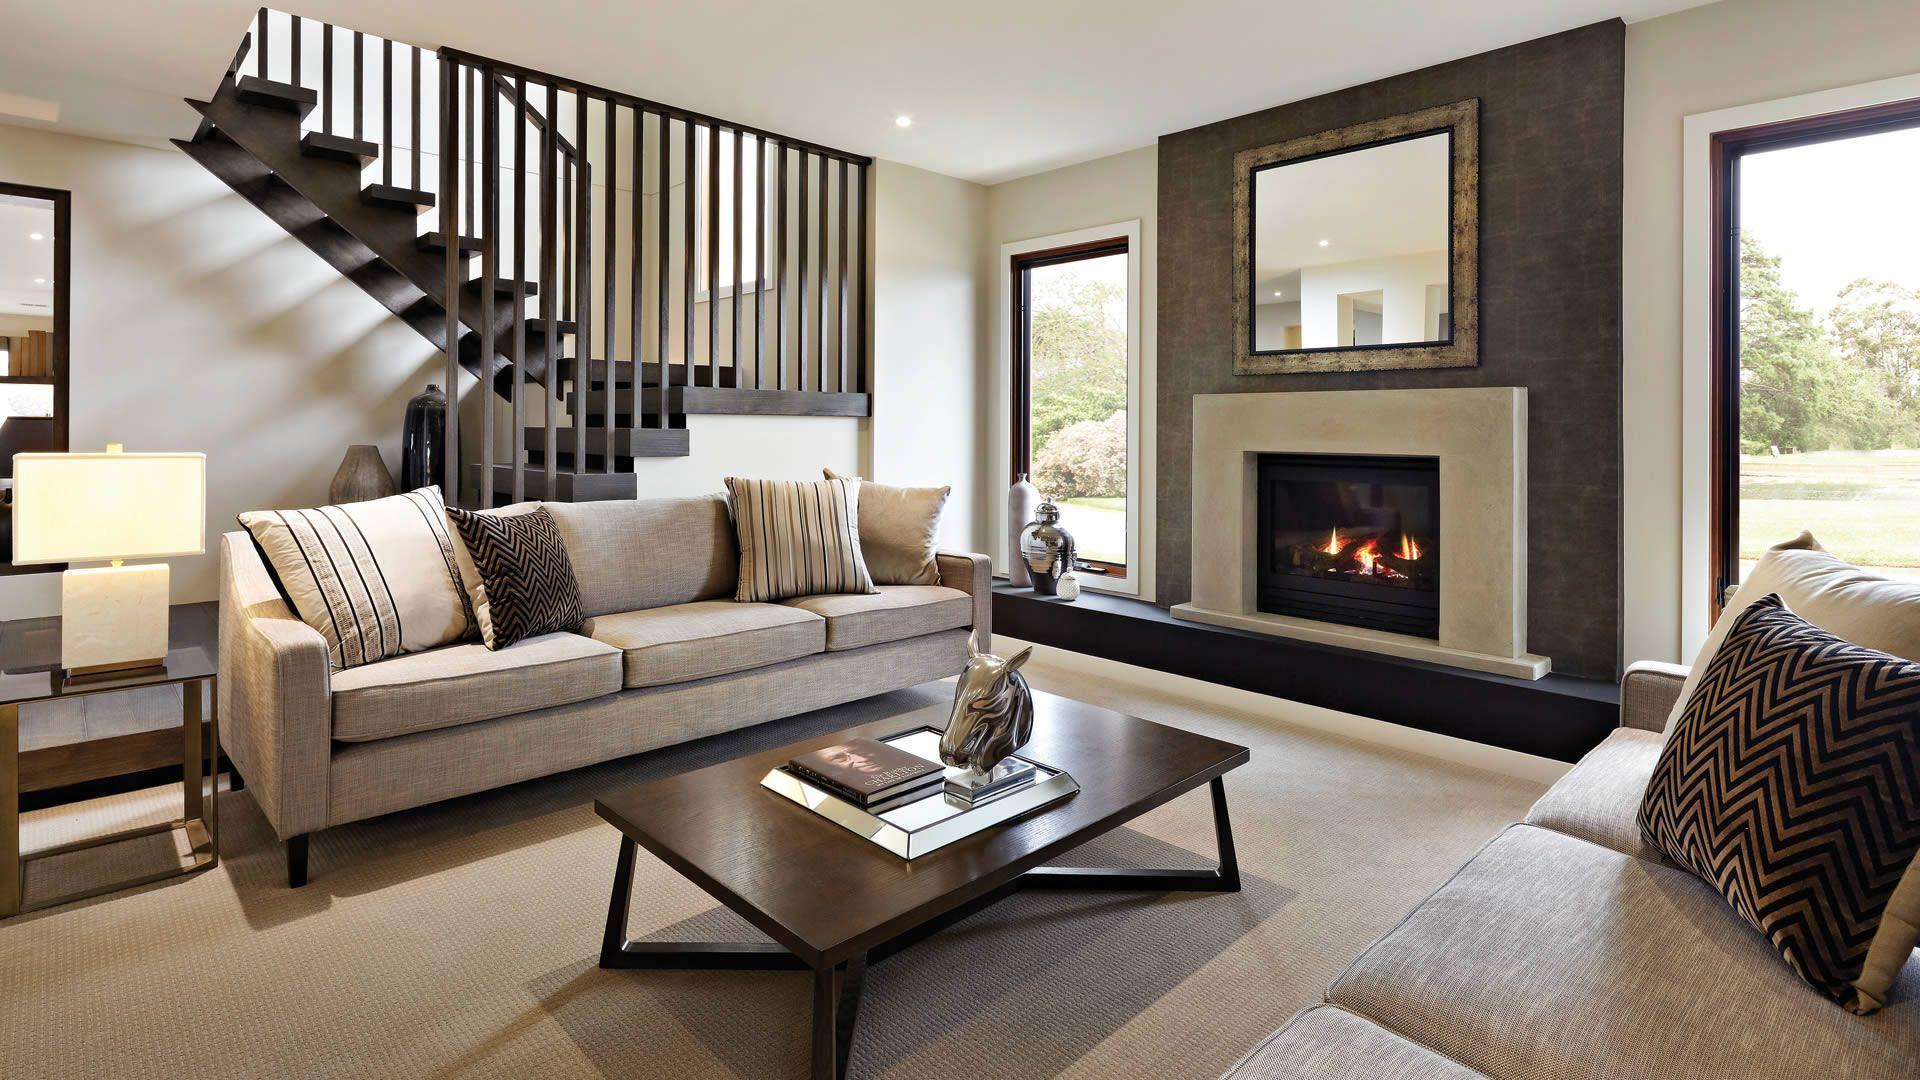 Barwon MK2 By Carlisle Homes (16) | Interior Design | Pinterest | Carlisle,  Open Plan And Staircases Part 78